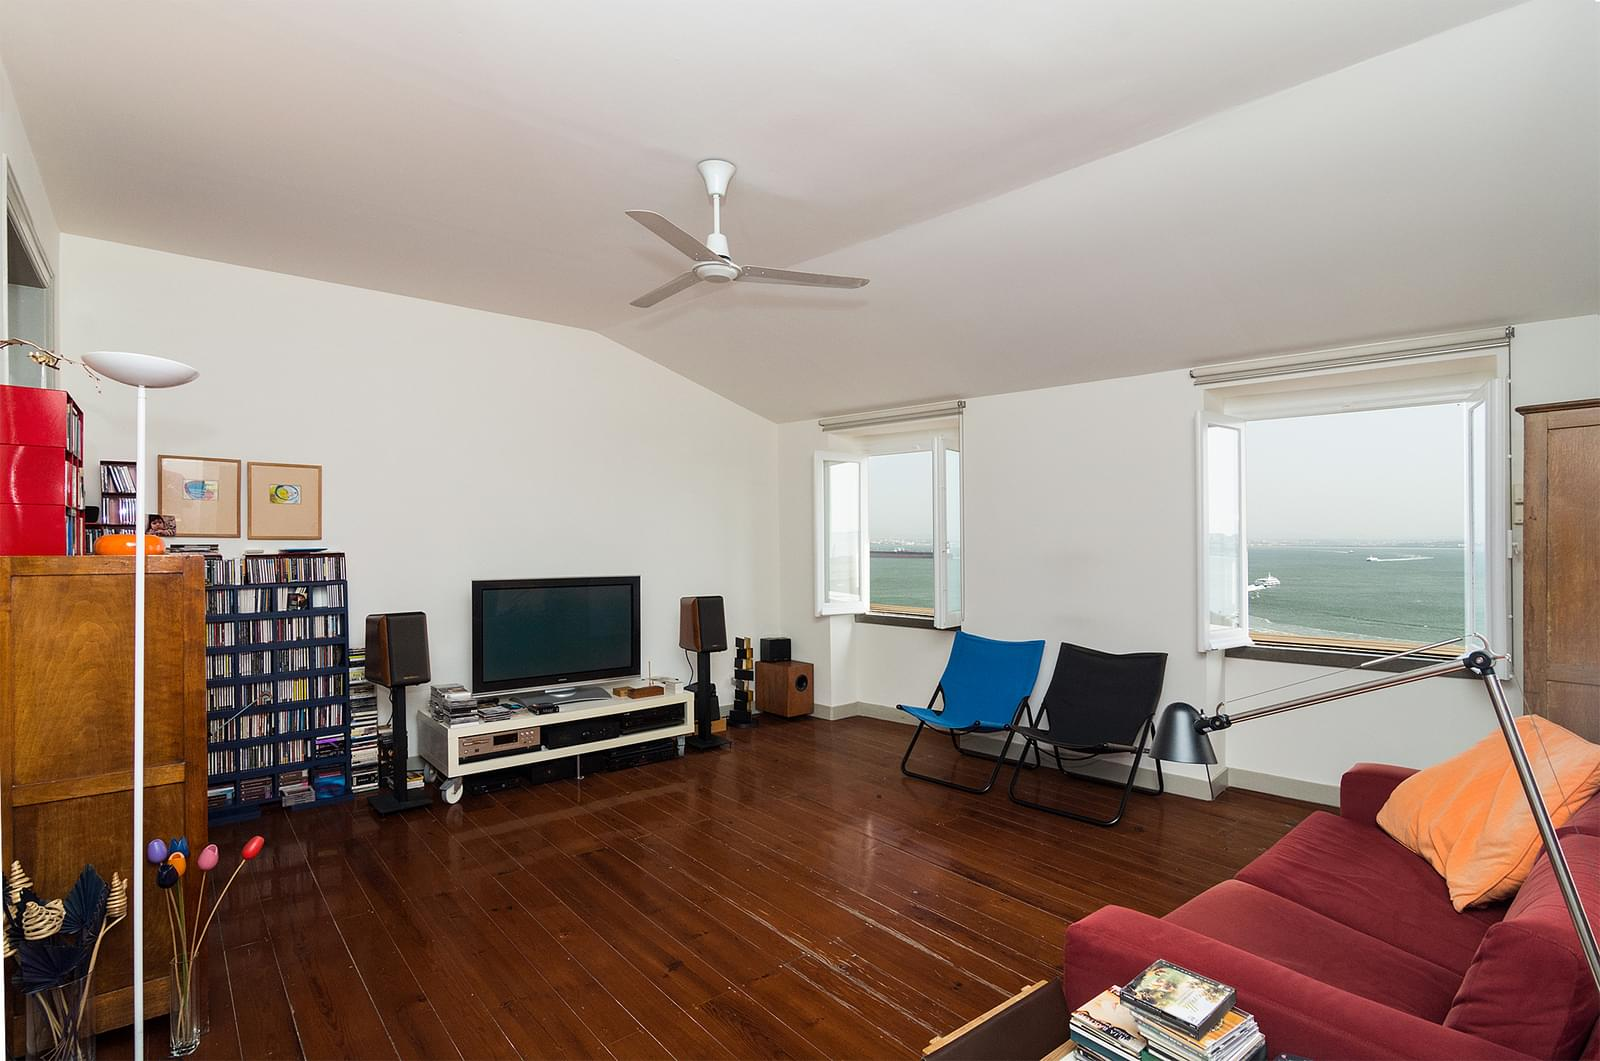 pf17052-apartamento-t3-lisboa-1c0a9e91-a44b-4ad9-bf30-57e7d6ad6399